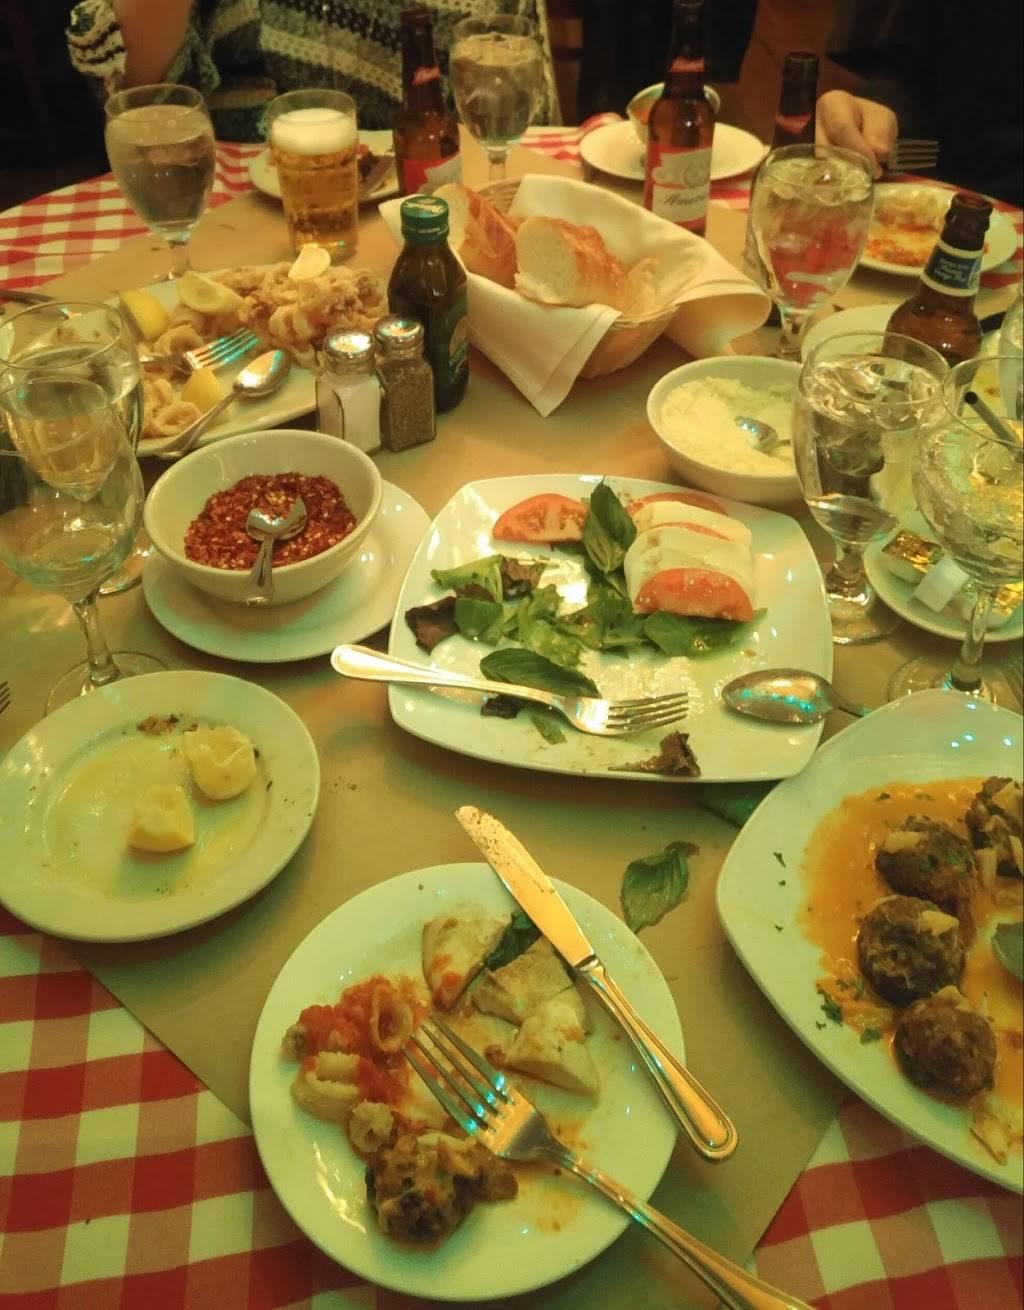 Picasso Italian Restaurant | restaurant | 3505 Veterans Memorial Hwy, Ronkonkoma, NY 11779, USA | 6316765556 OR +1 631-676-5556